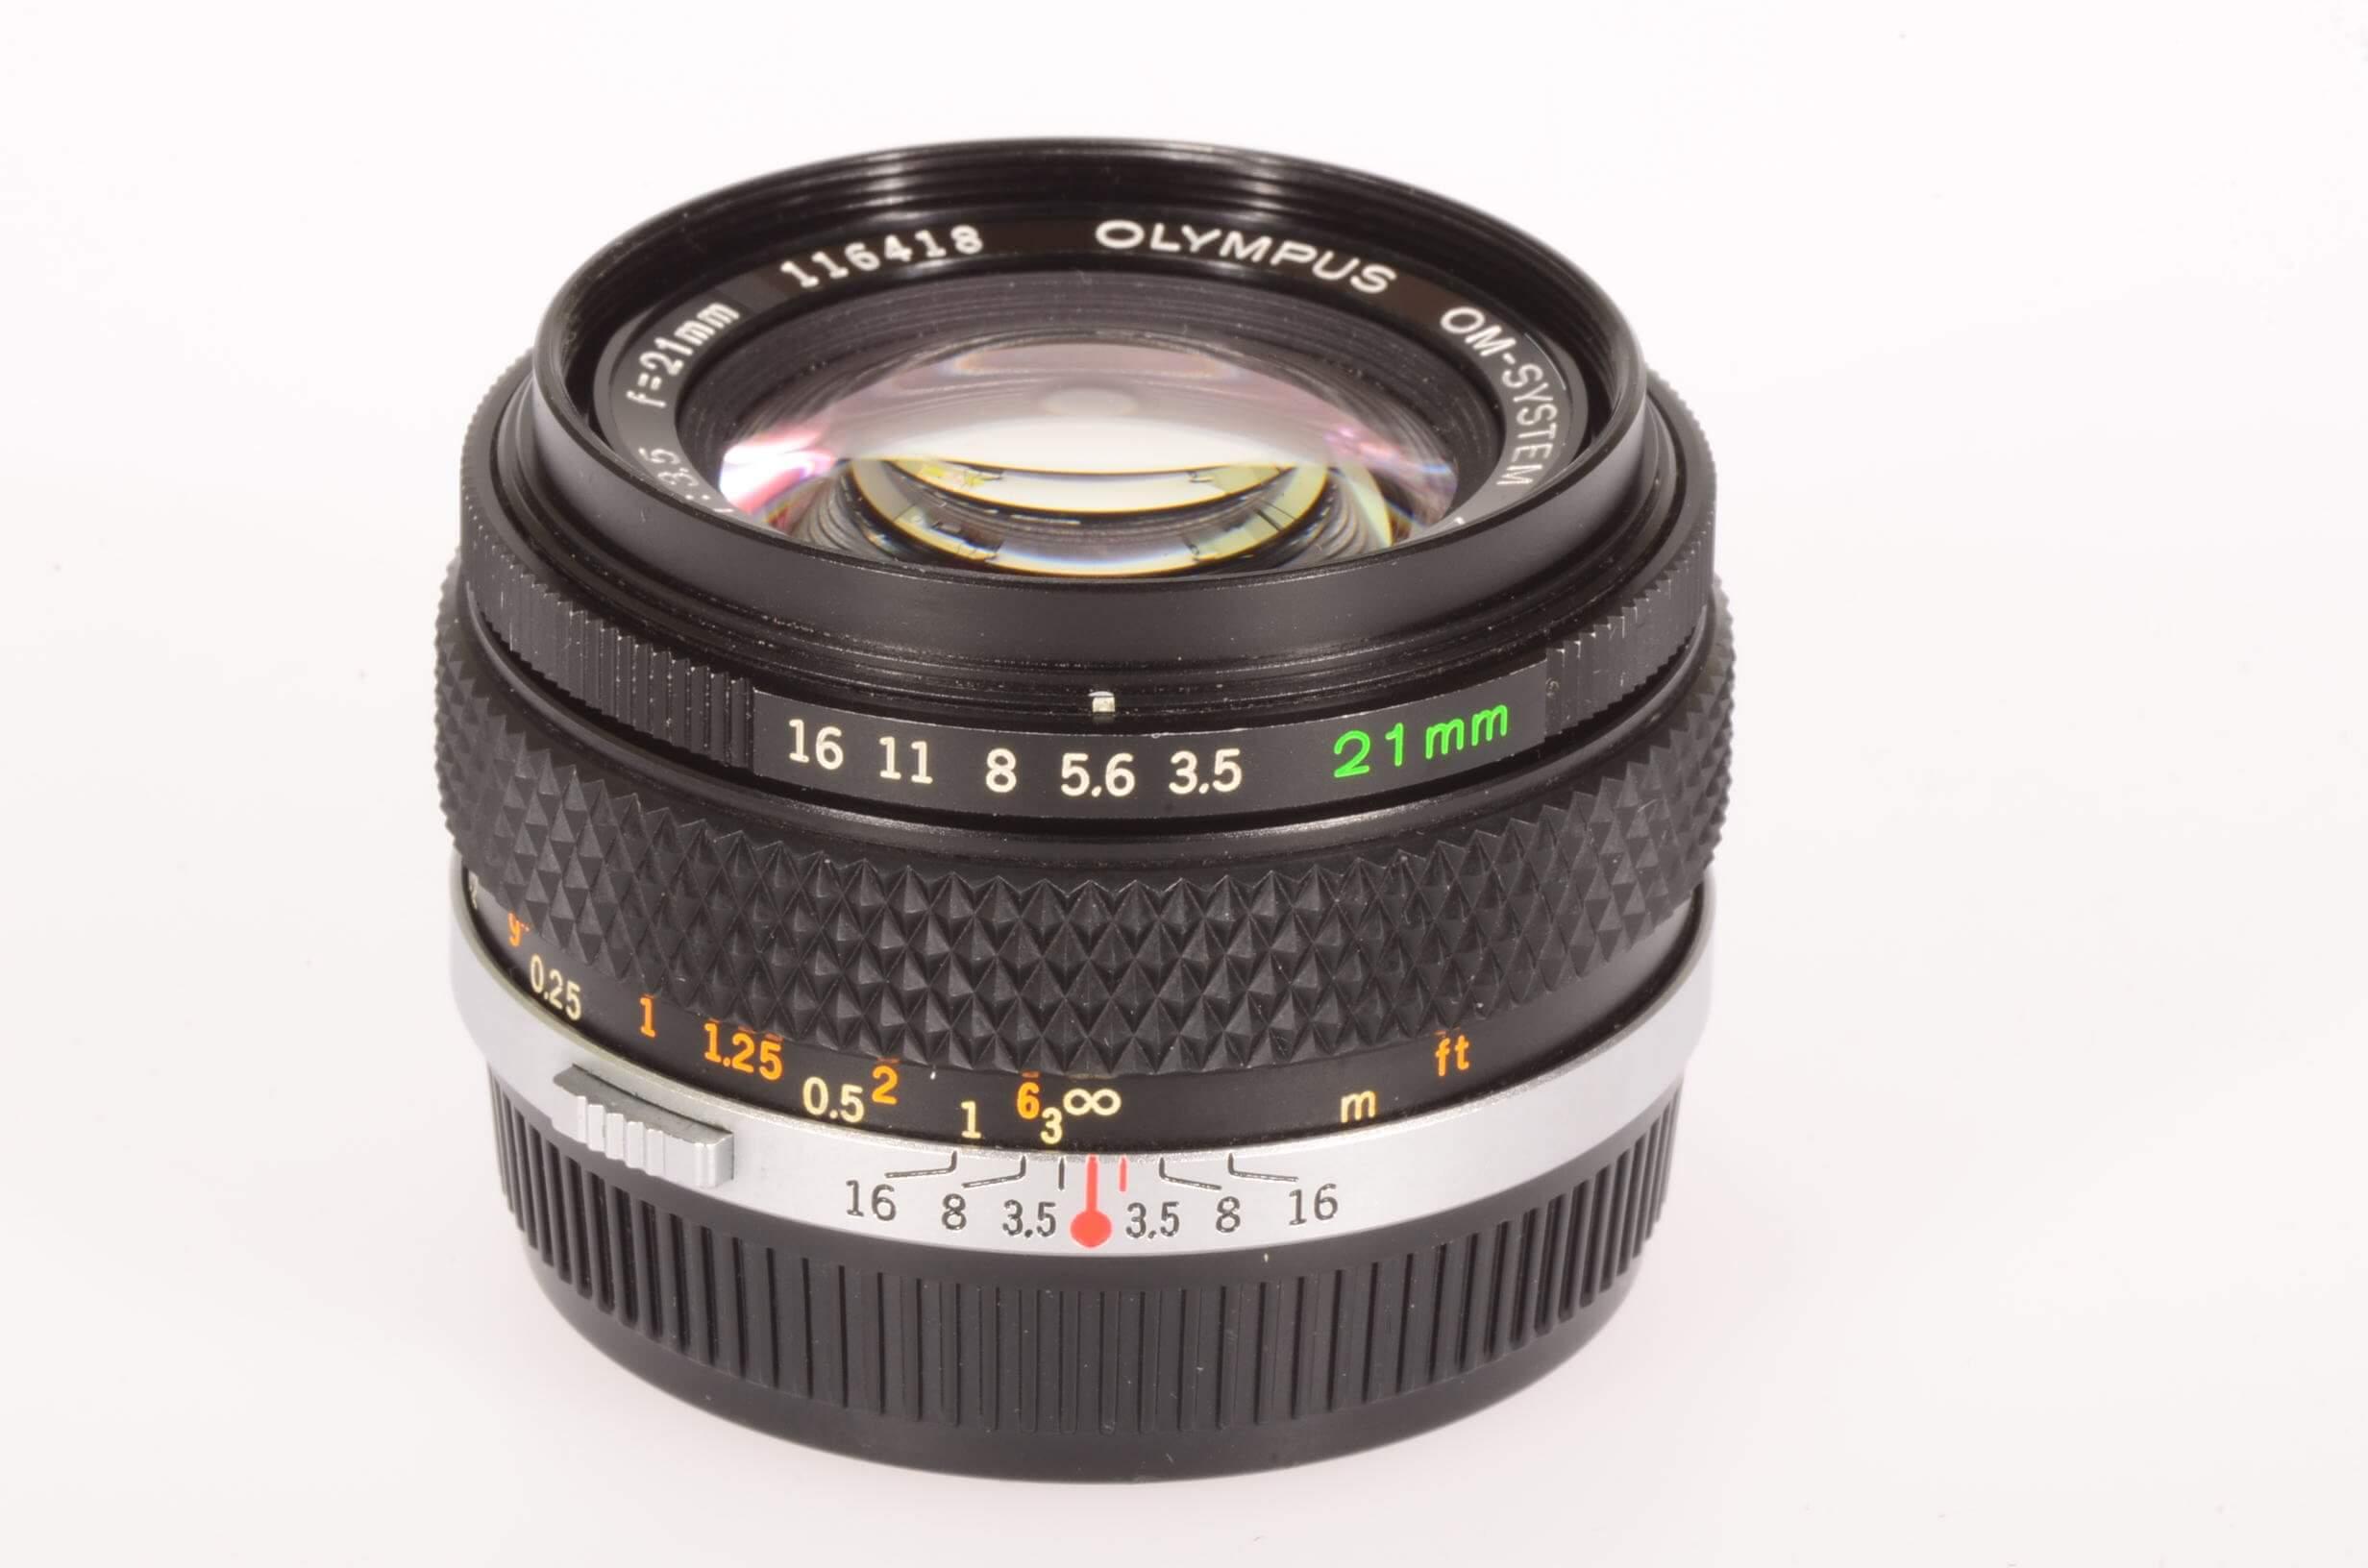 Olympus 21mm f3.5 Zuiko, virtually mint